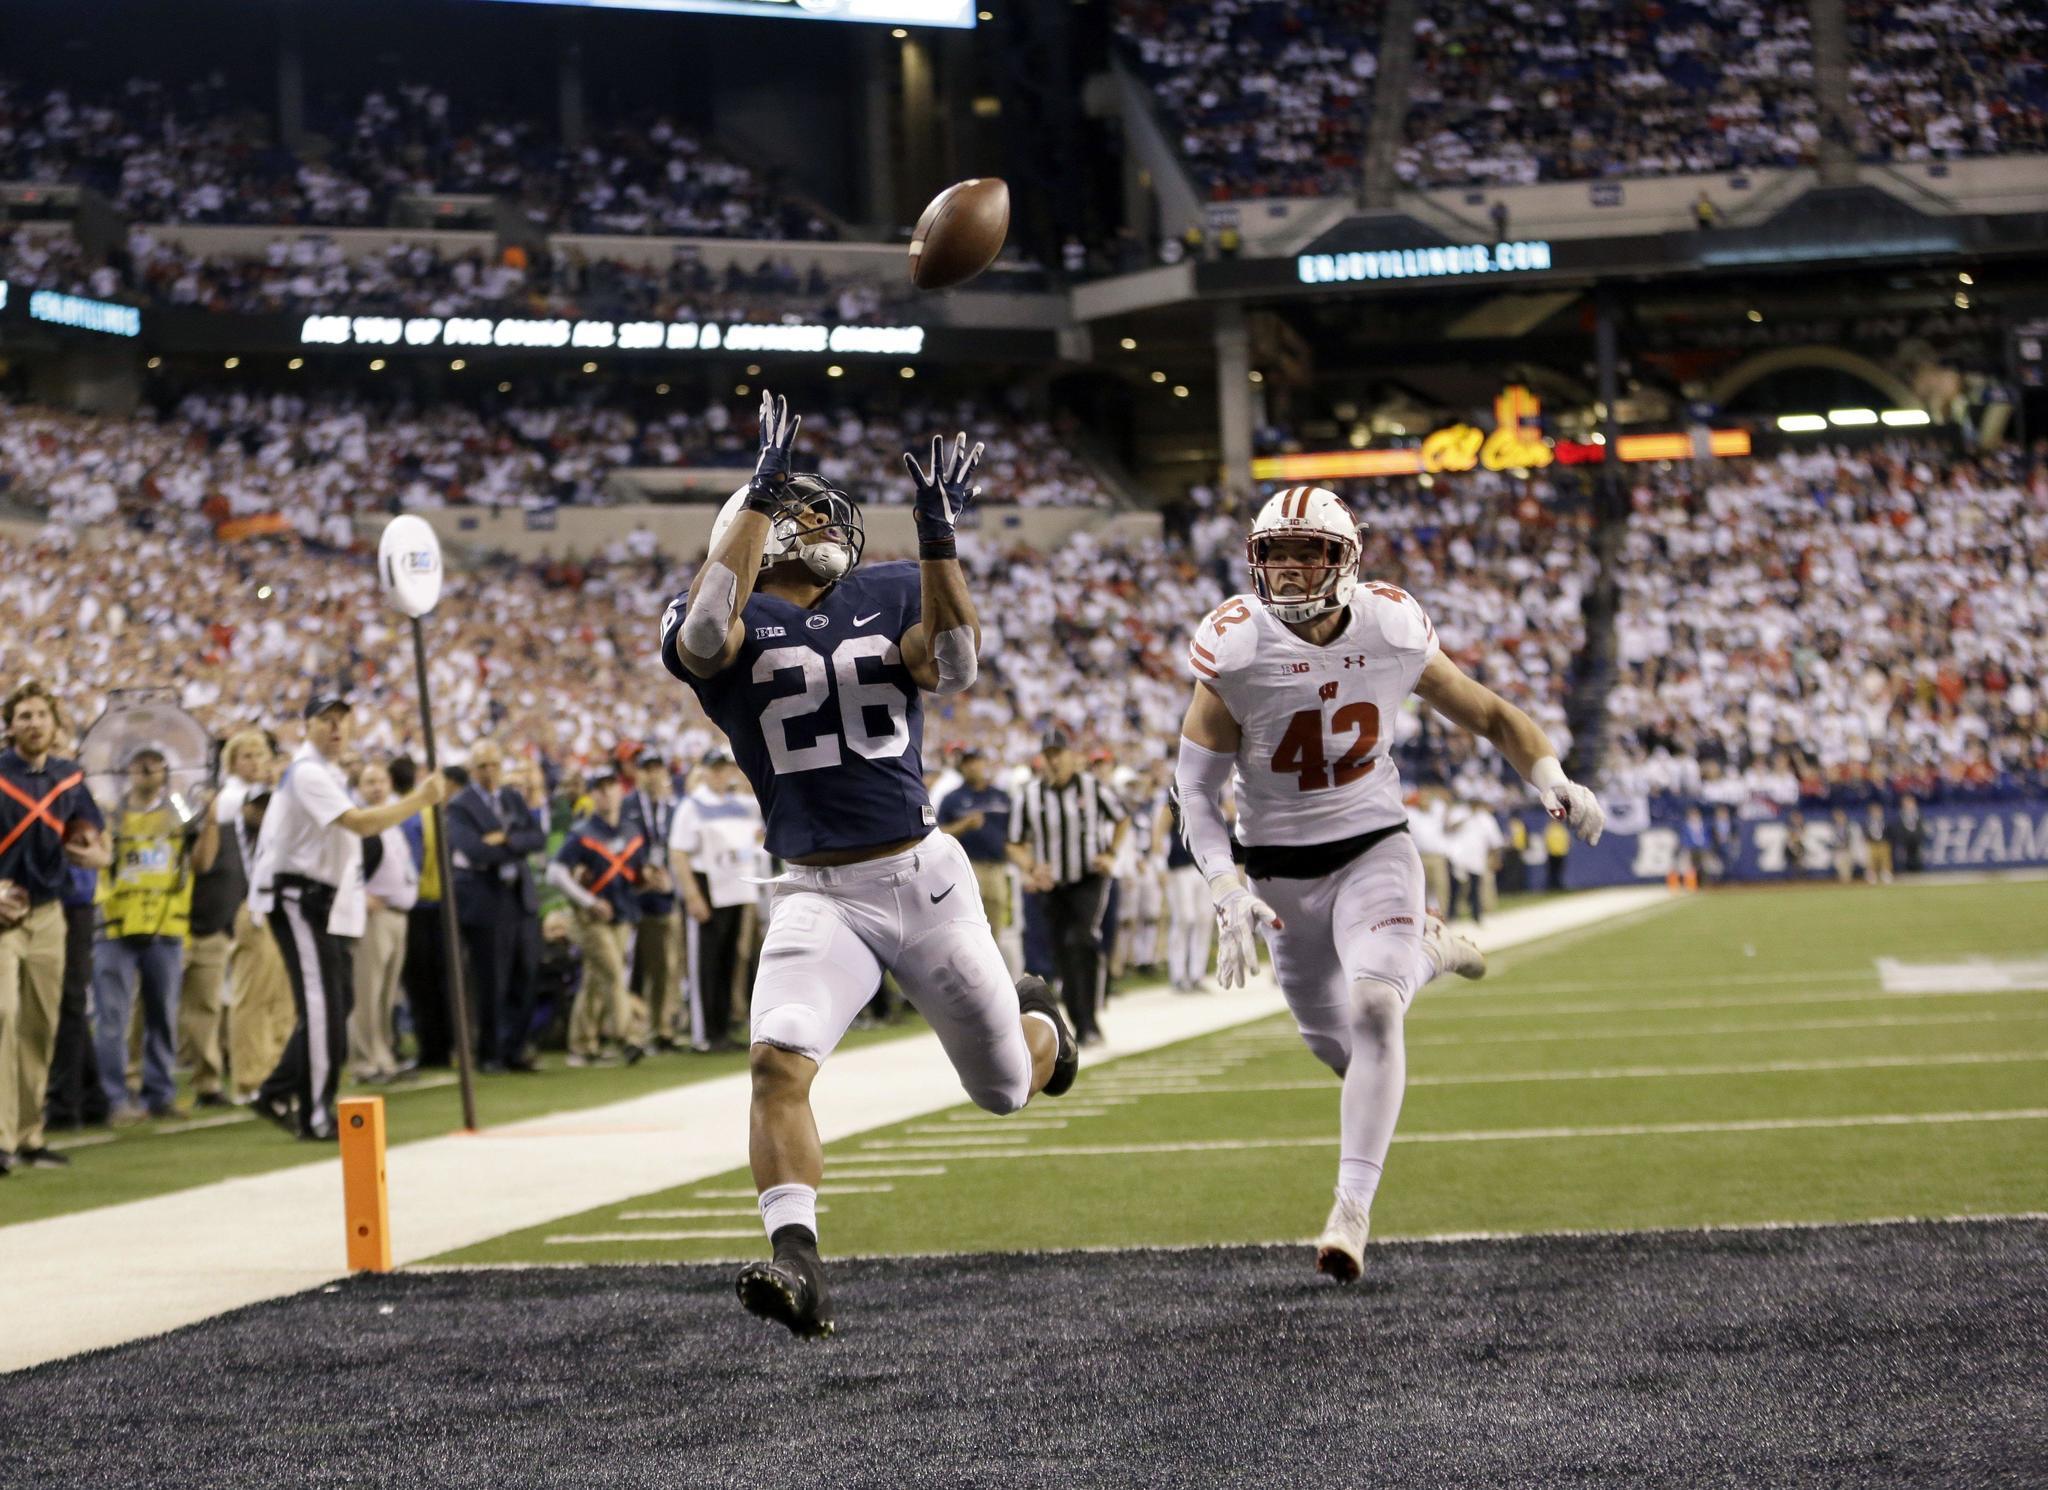 Penn State s Saquon Barkley seeks the next step of his career at the Rose  Bowl - Capital Gazette 15e12ac1b